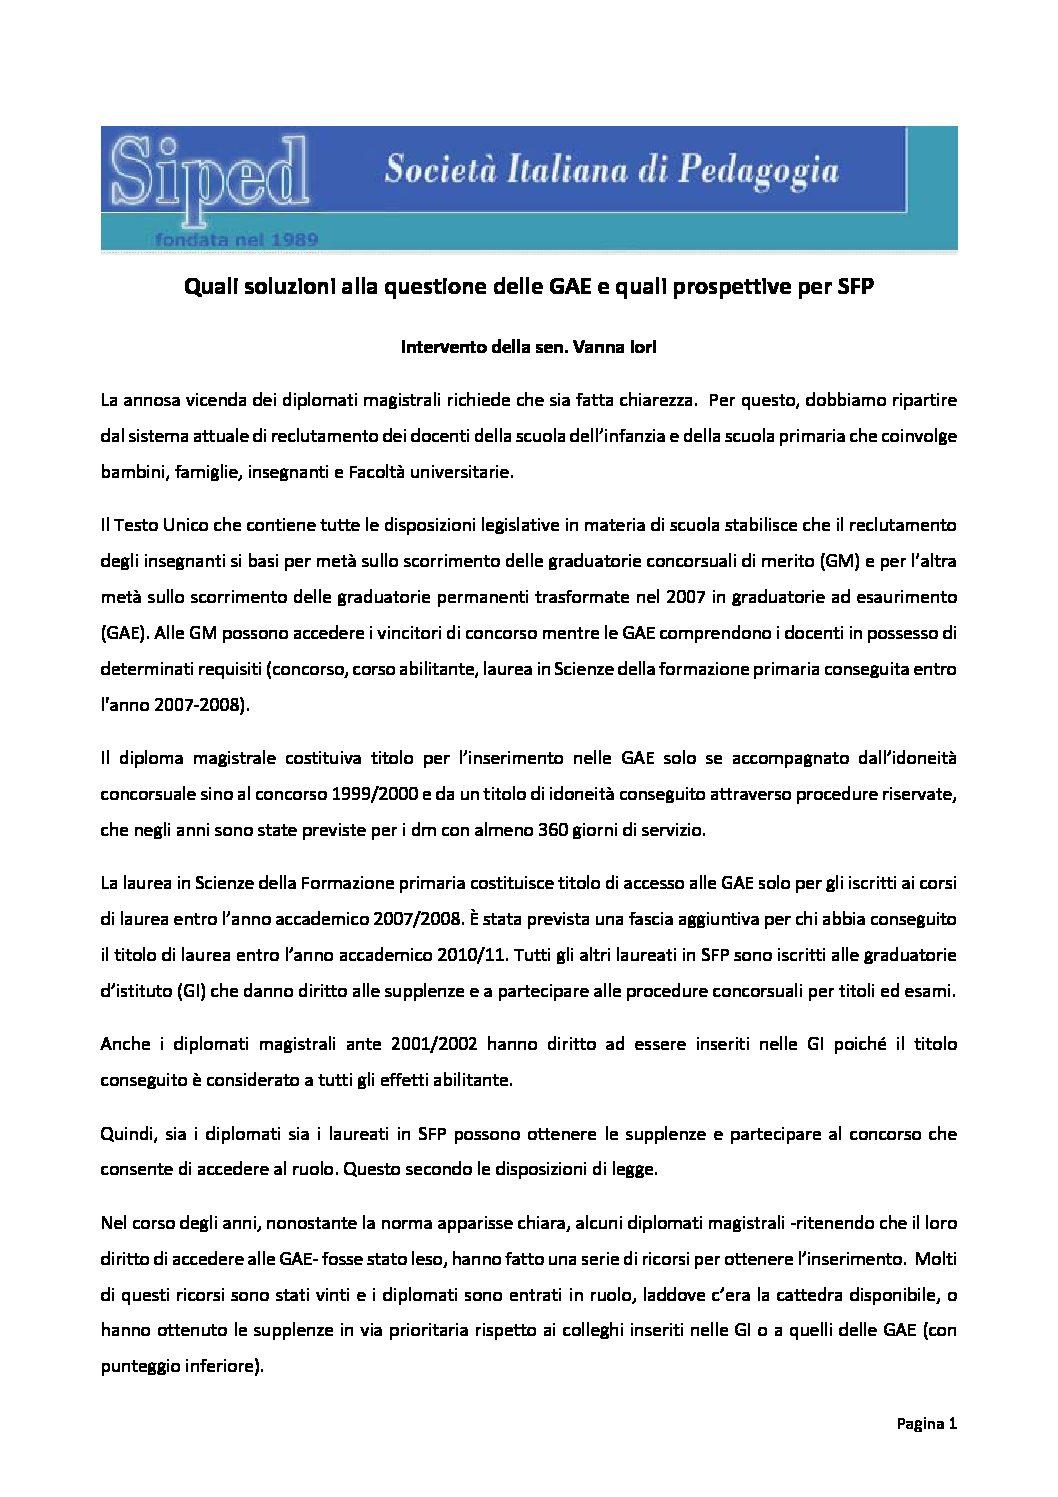 2018.07.20 – Intervento sen. Iori su GAE e SFP